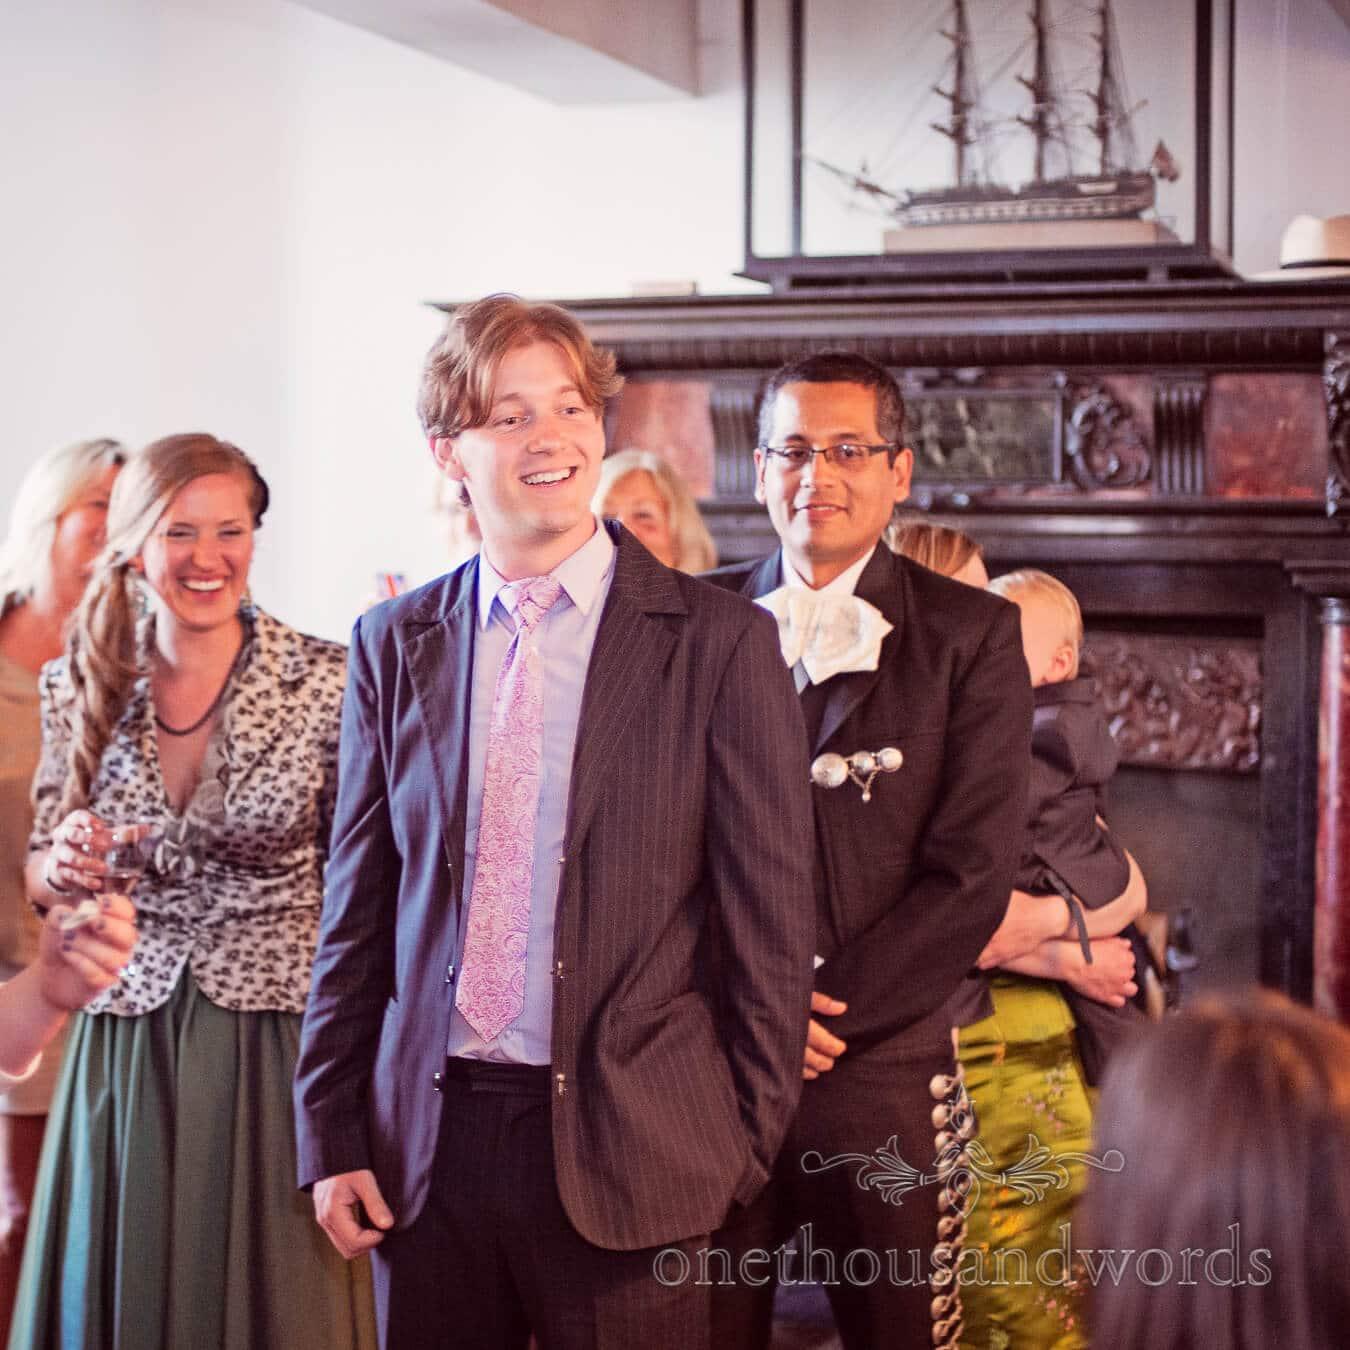 Wedding guest sings to bride and groom at Porth en Alls